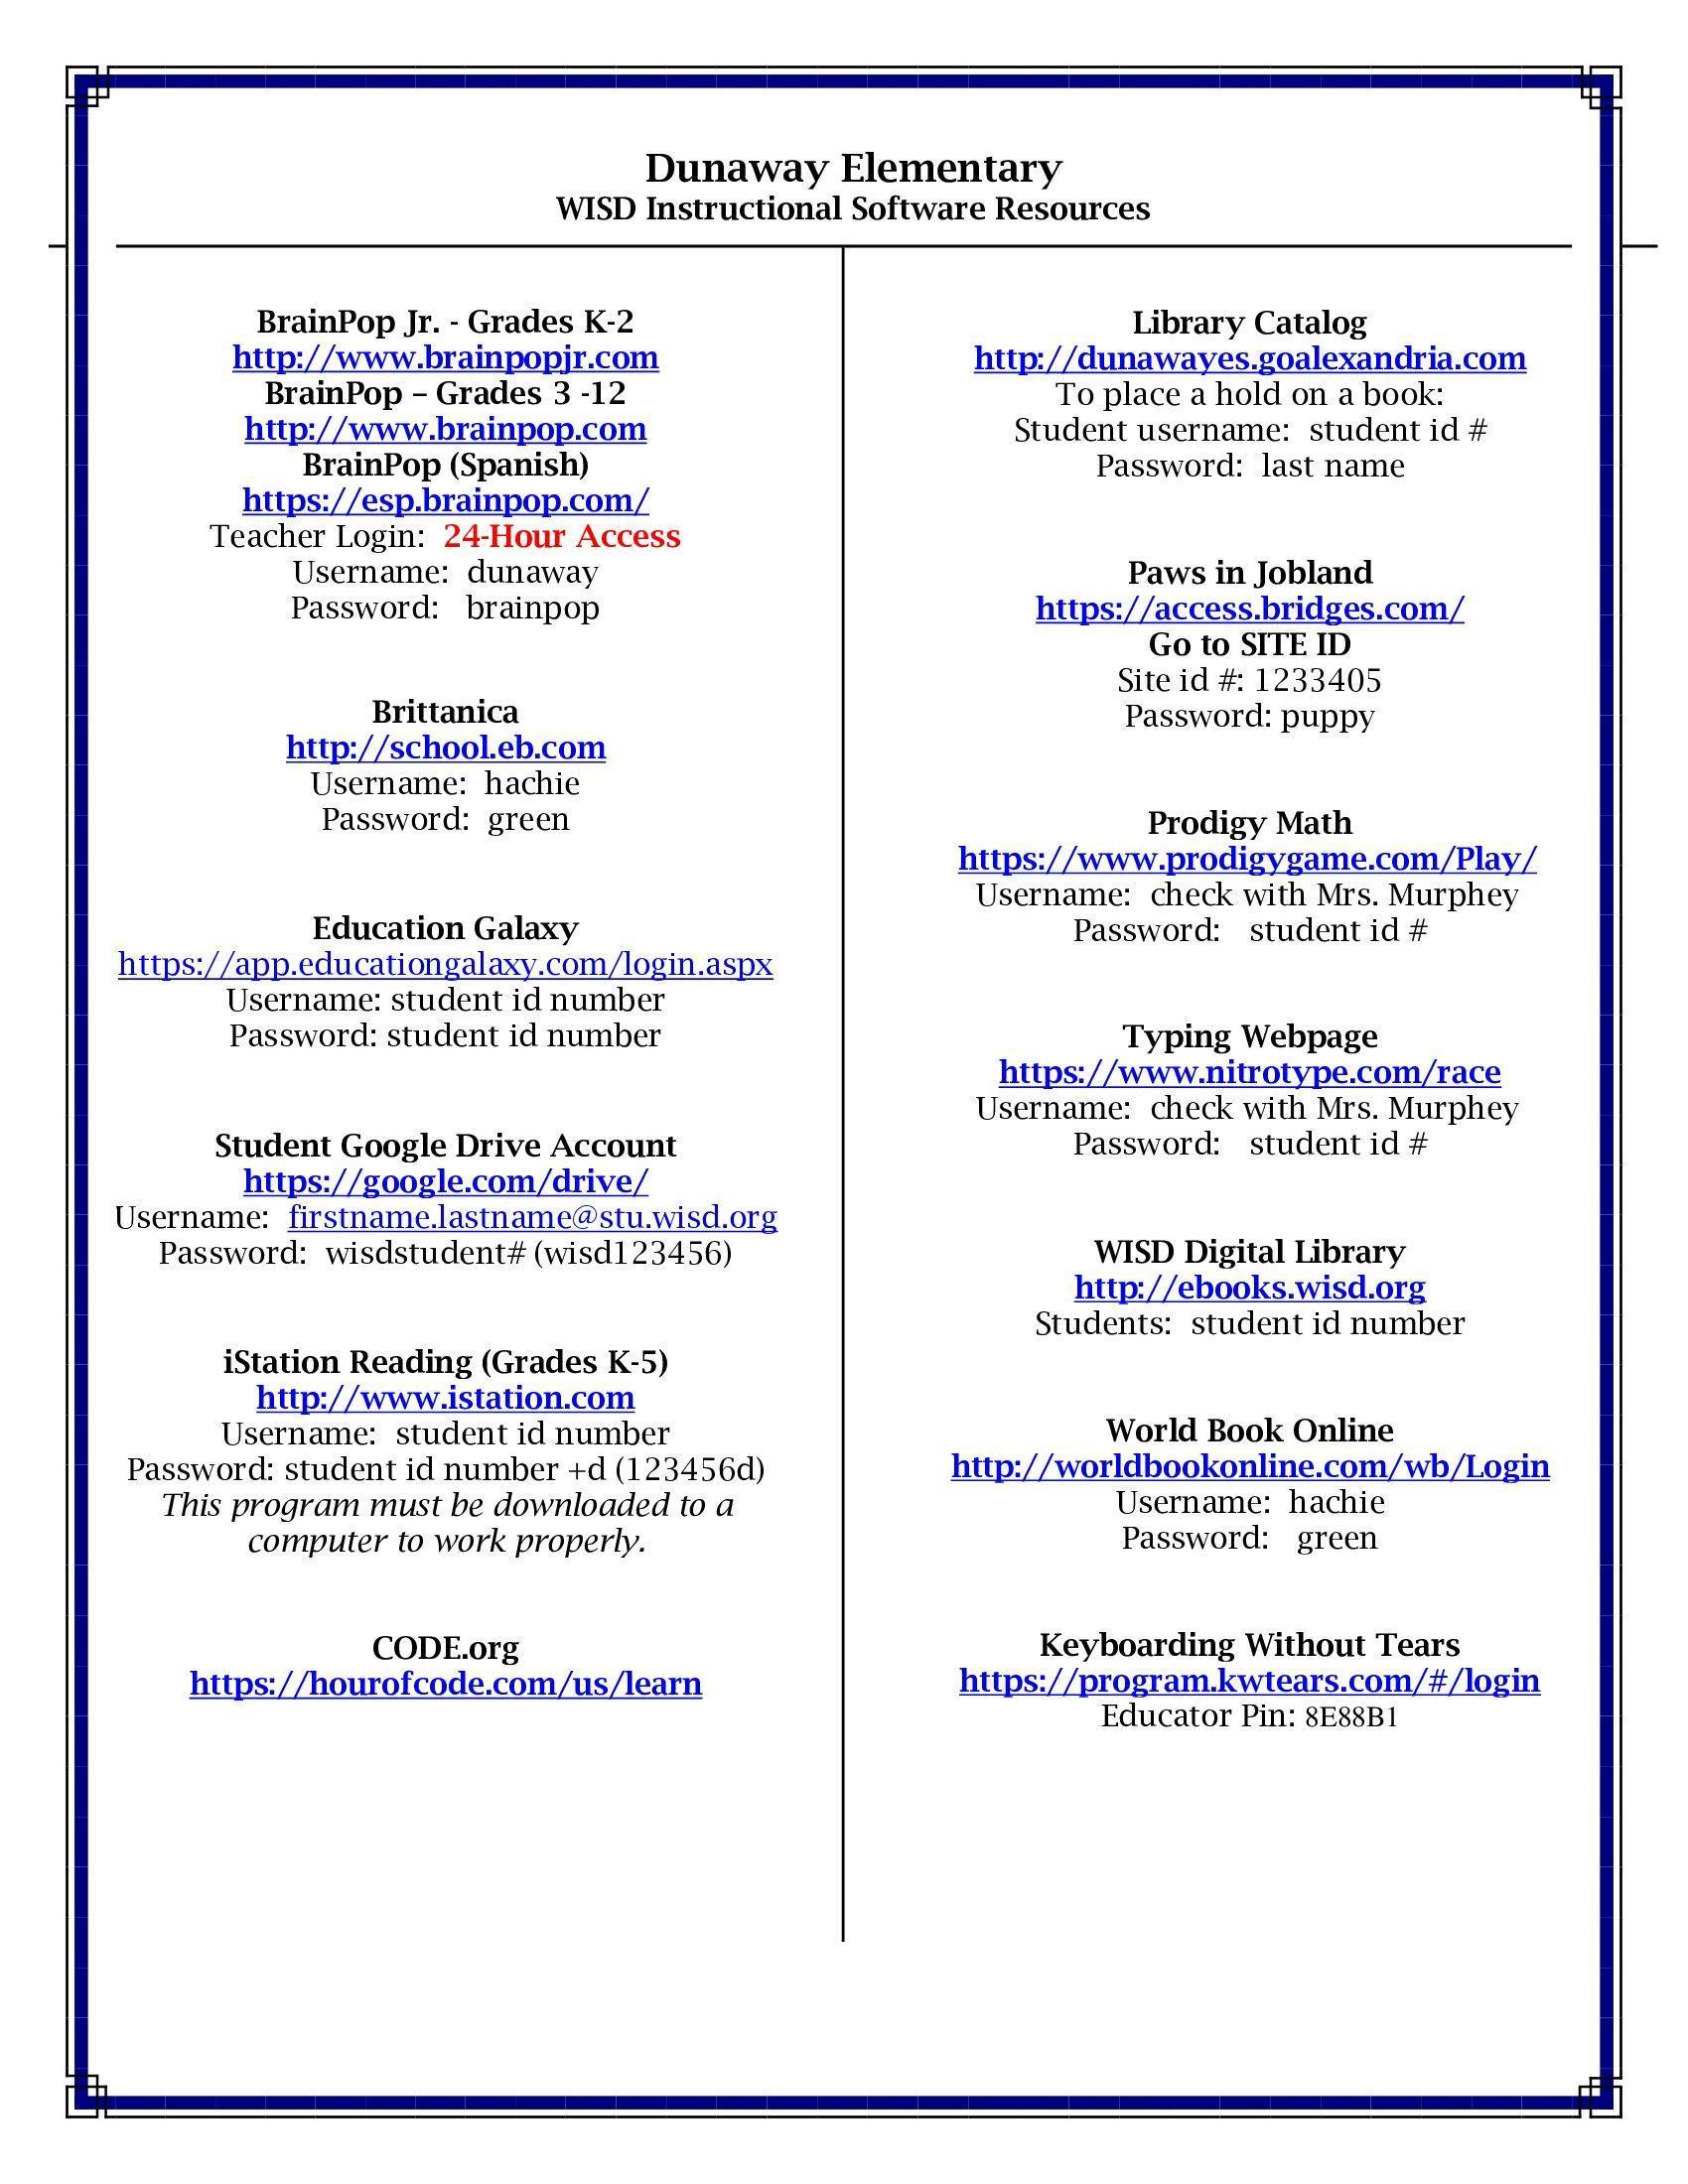 dunaway student resource list